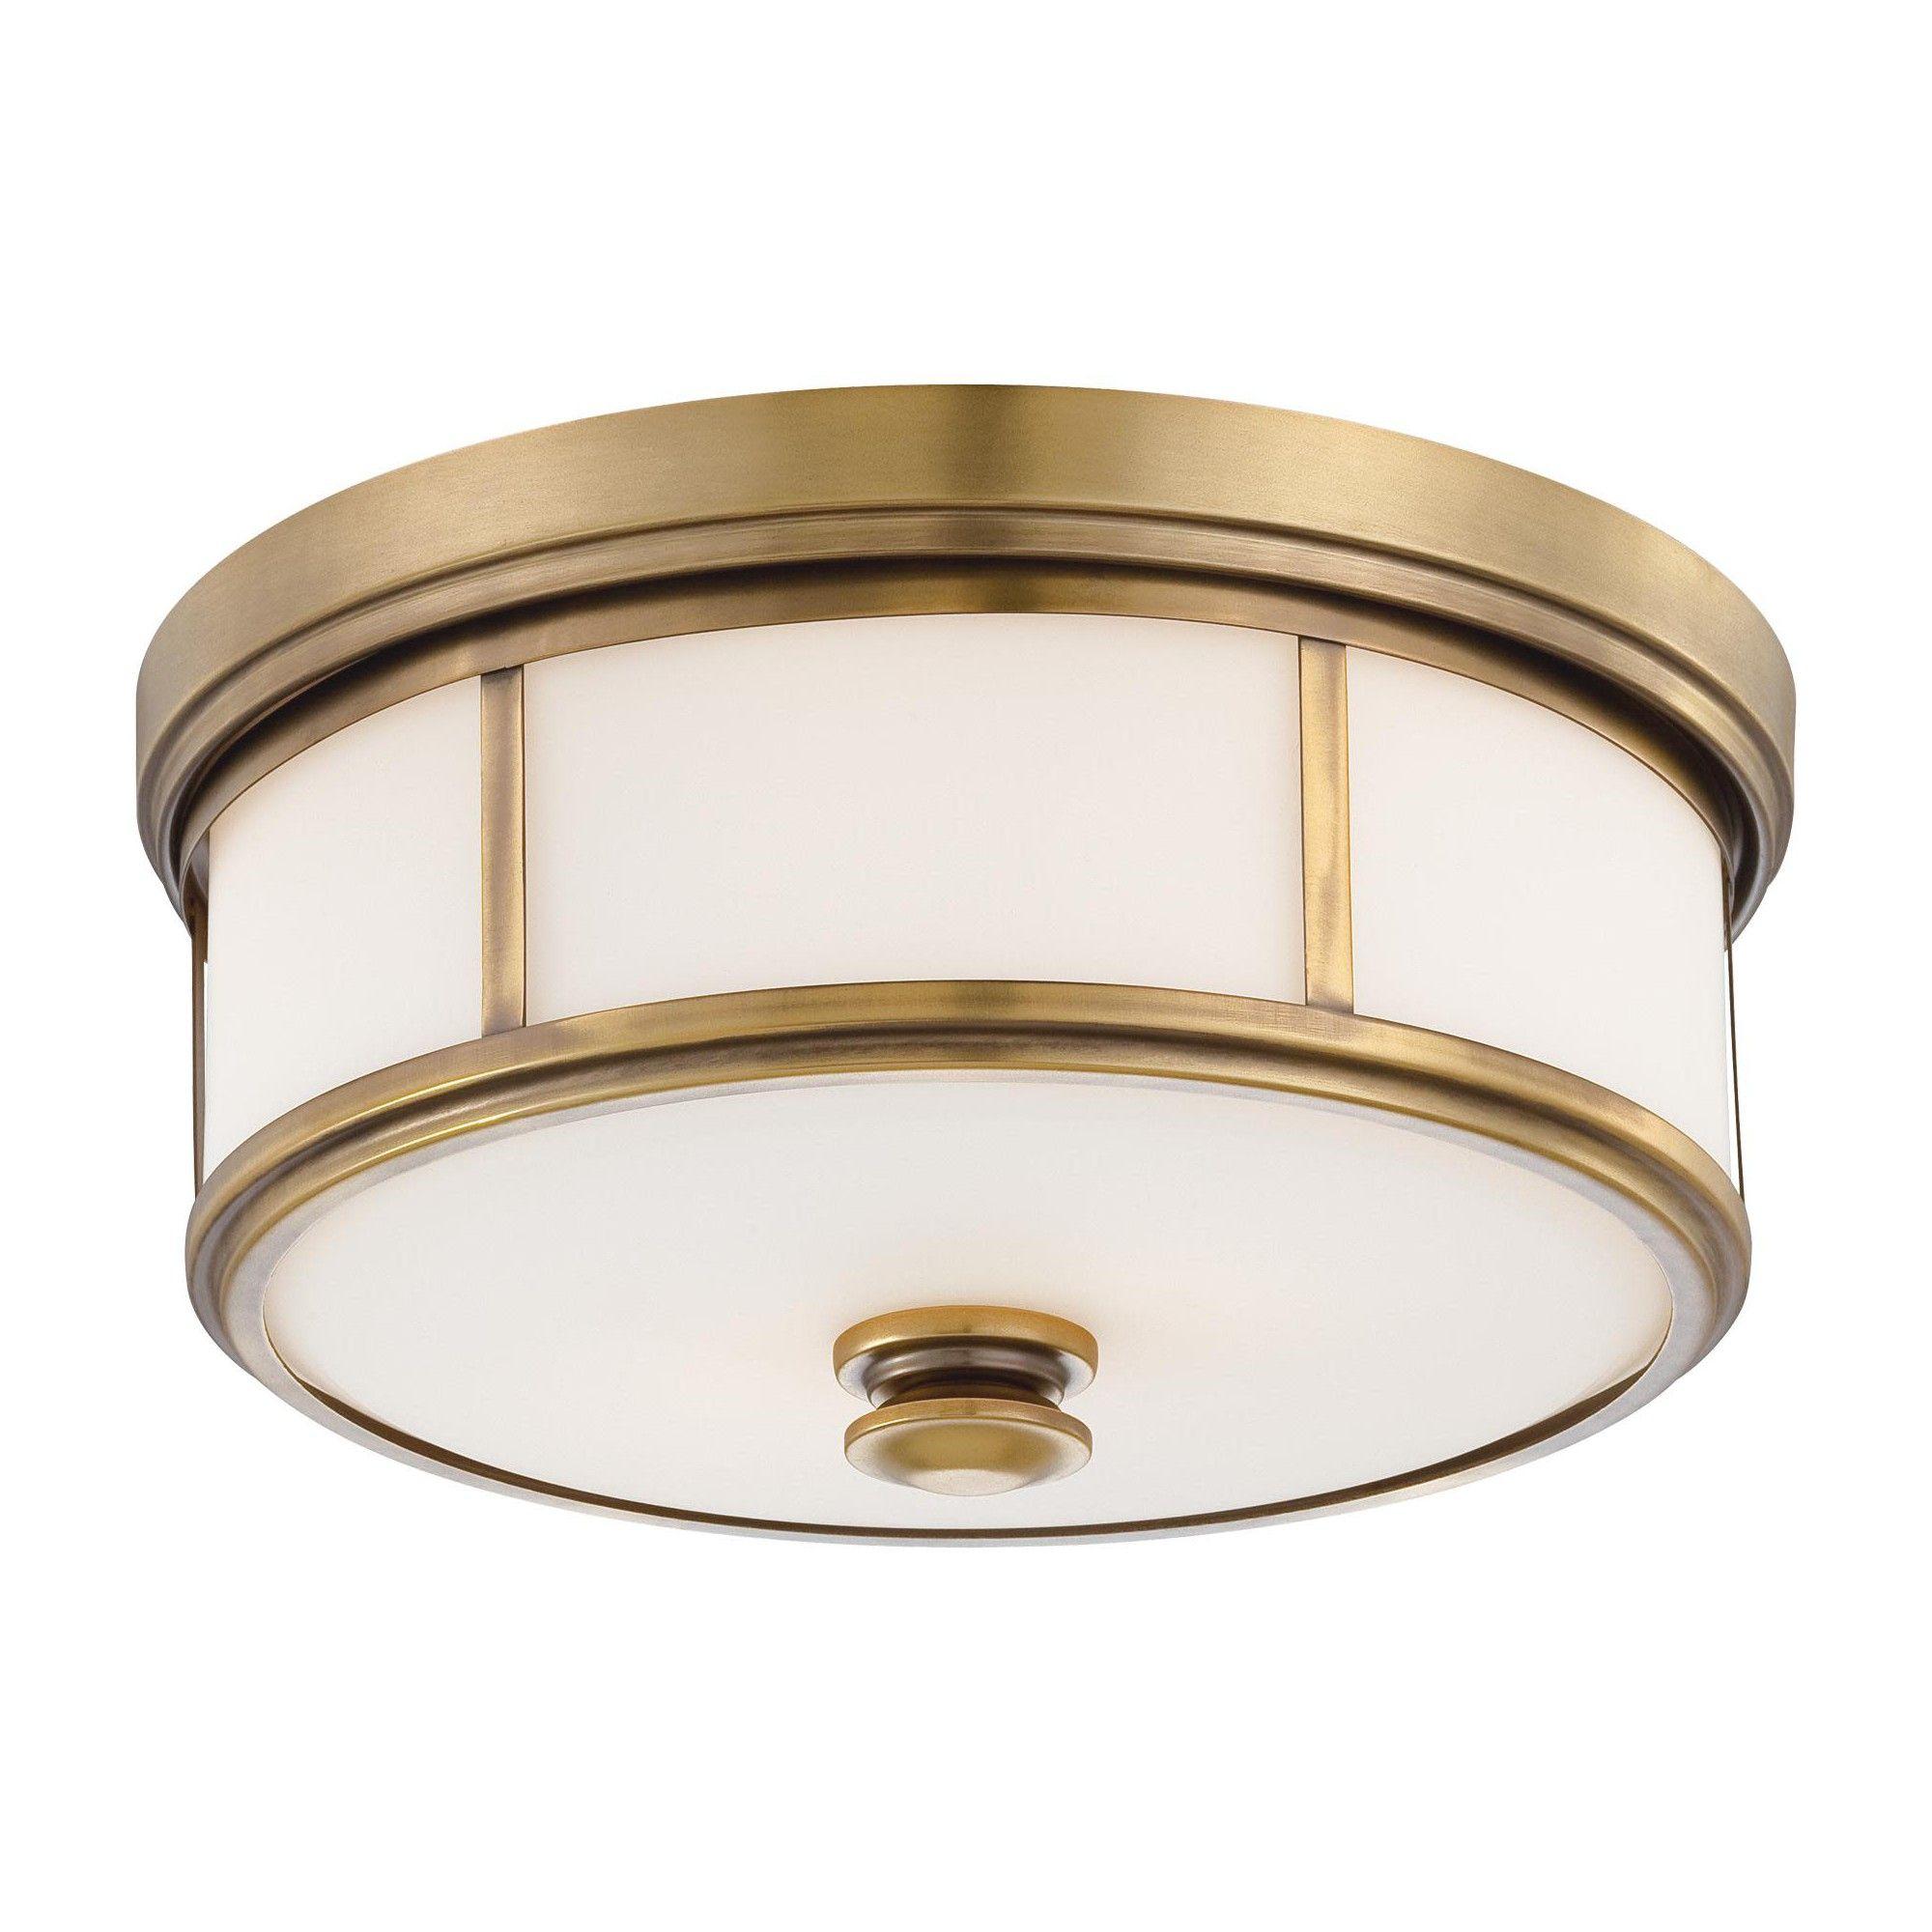 Minka Lavery 4365 2 Light 13 5 Wide Flush Mount Ceiling Fixture